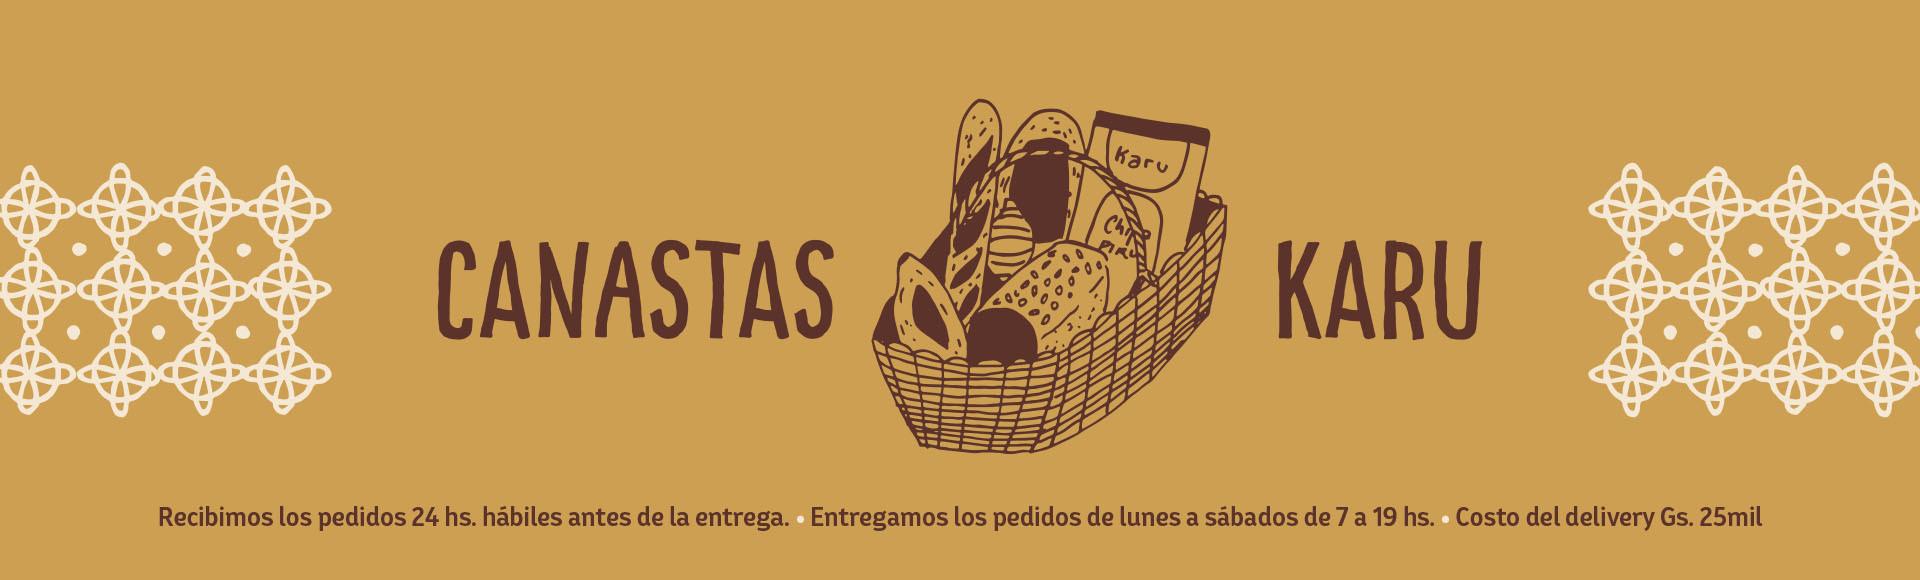 Canastas banner